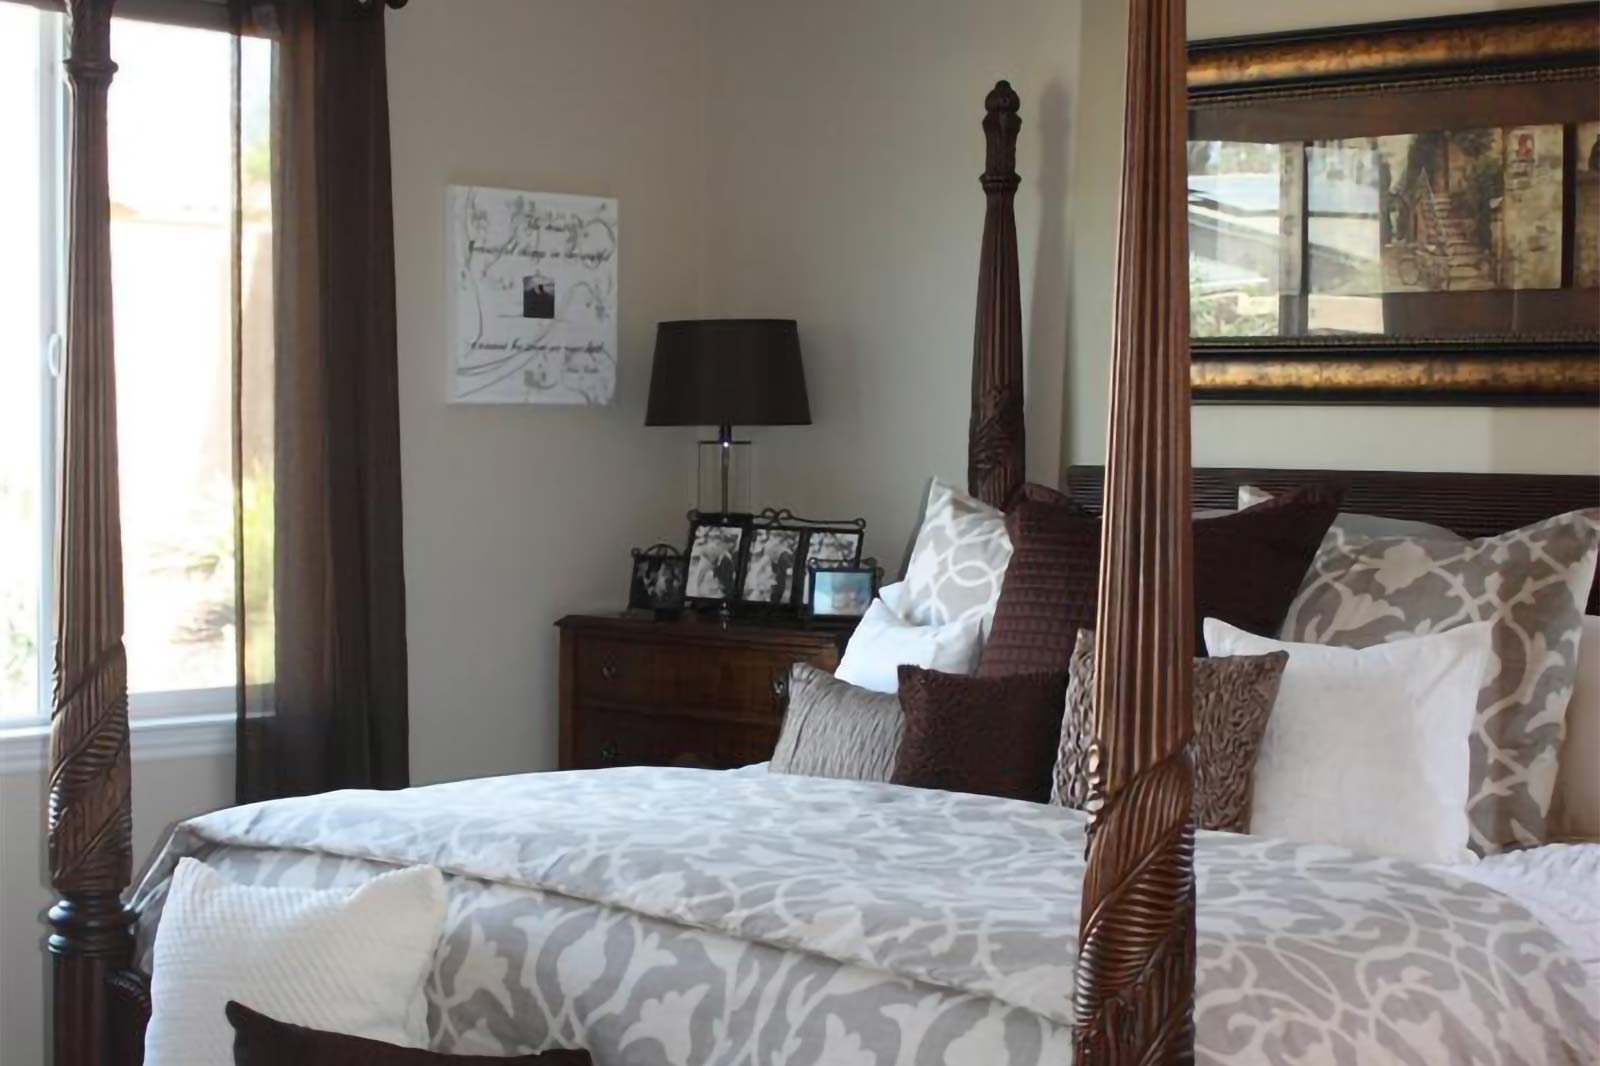 Trilogy Monarch Dunes real estate home 8 bedroom